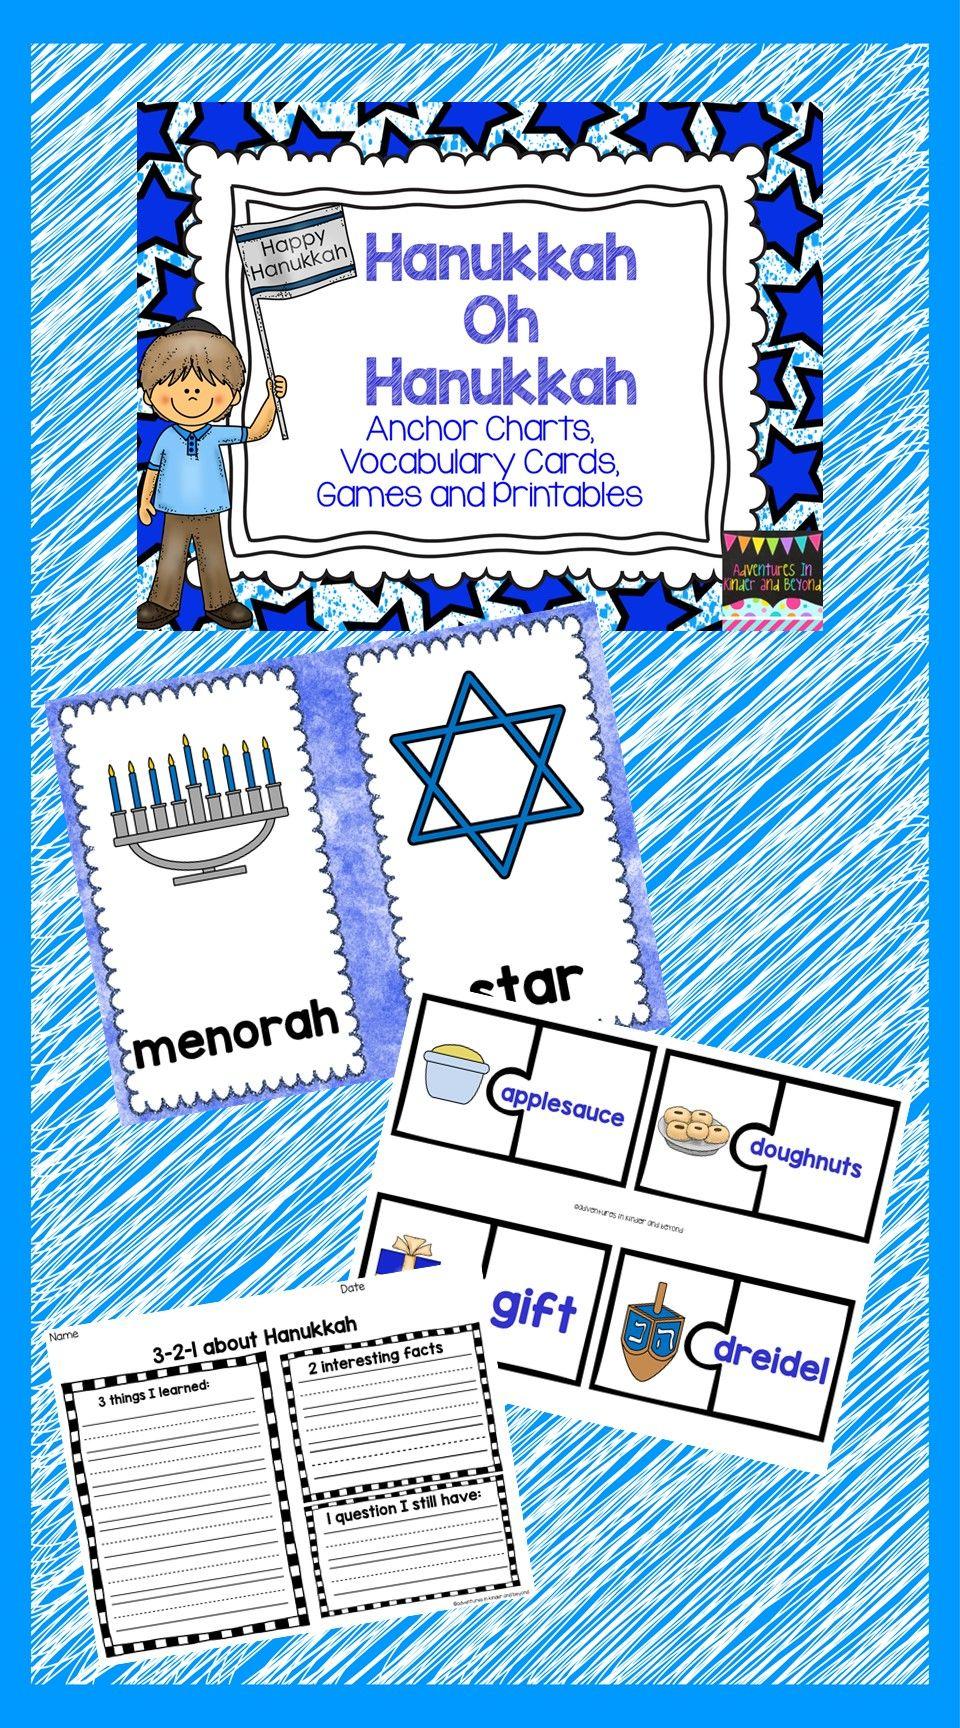 Hanukkah Mini Unit Christmas Teaching Resources Hanukkah Anchor Charts [ 1728 x 960 Pixel ]